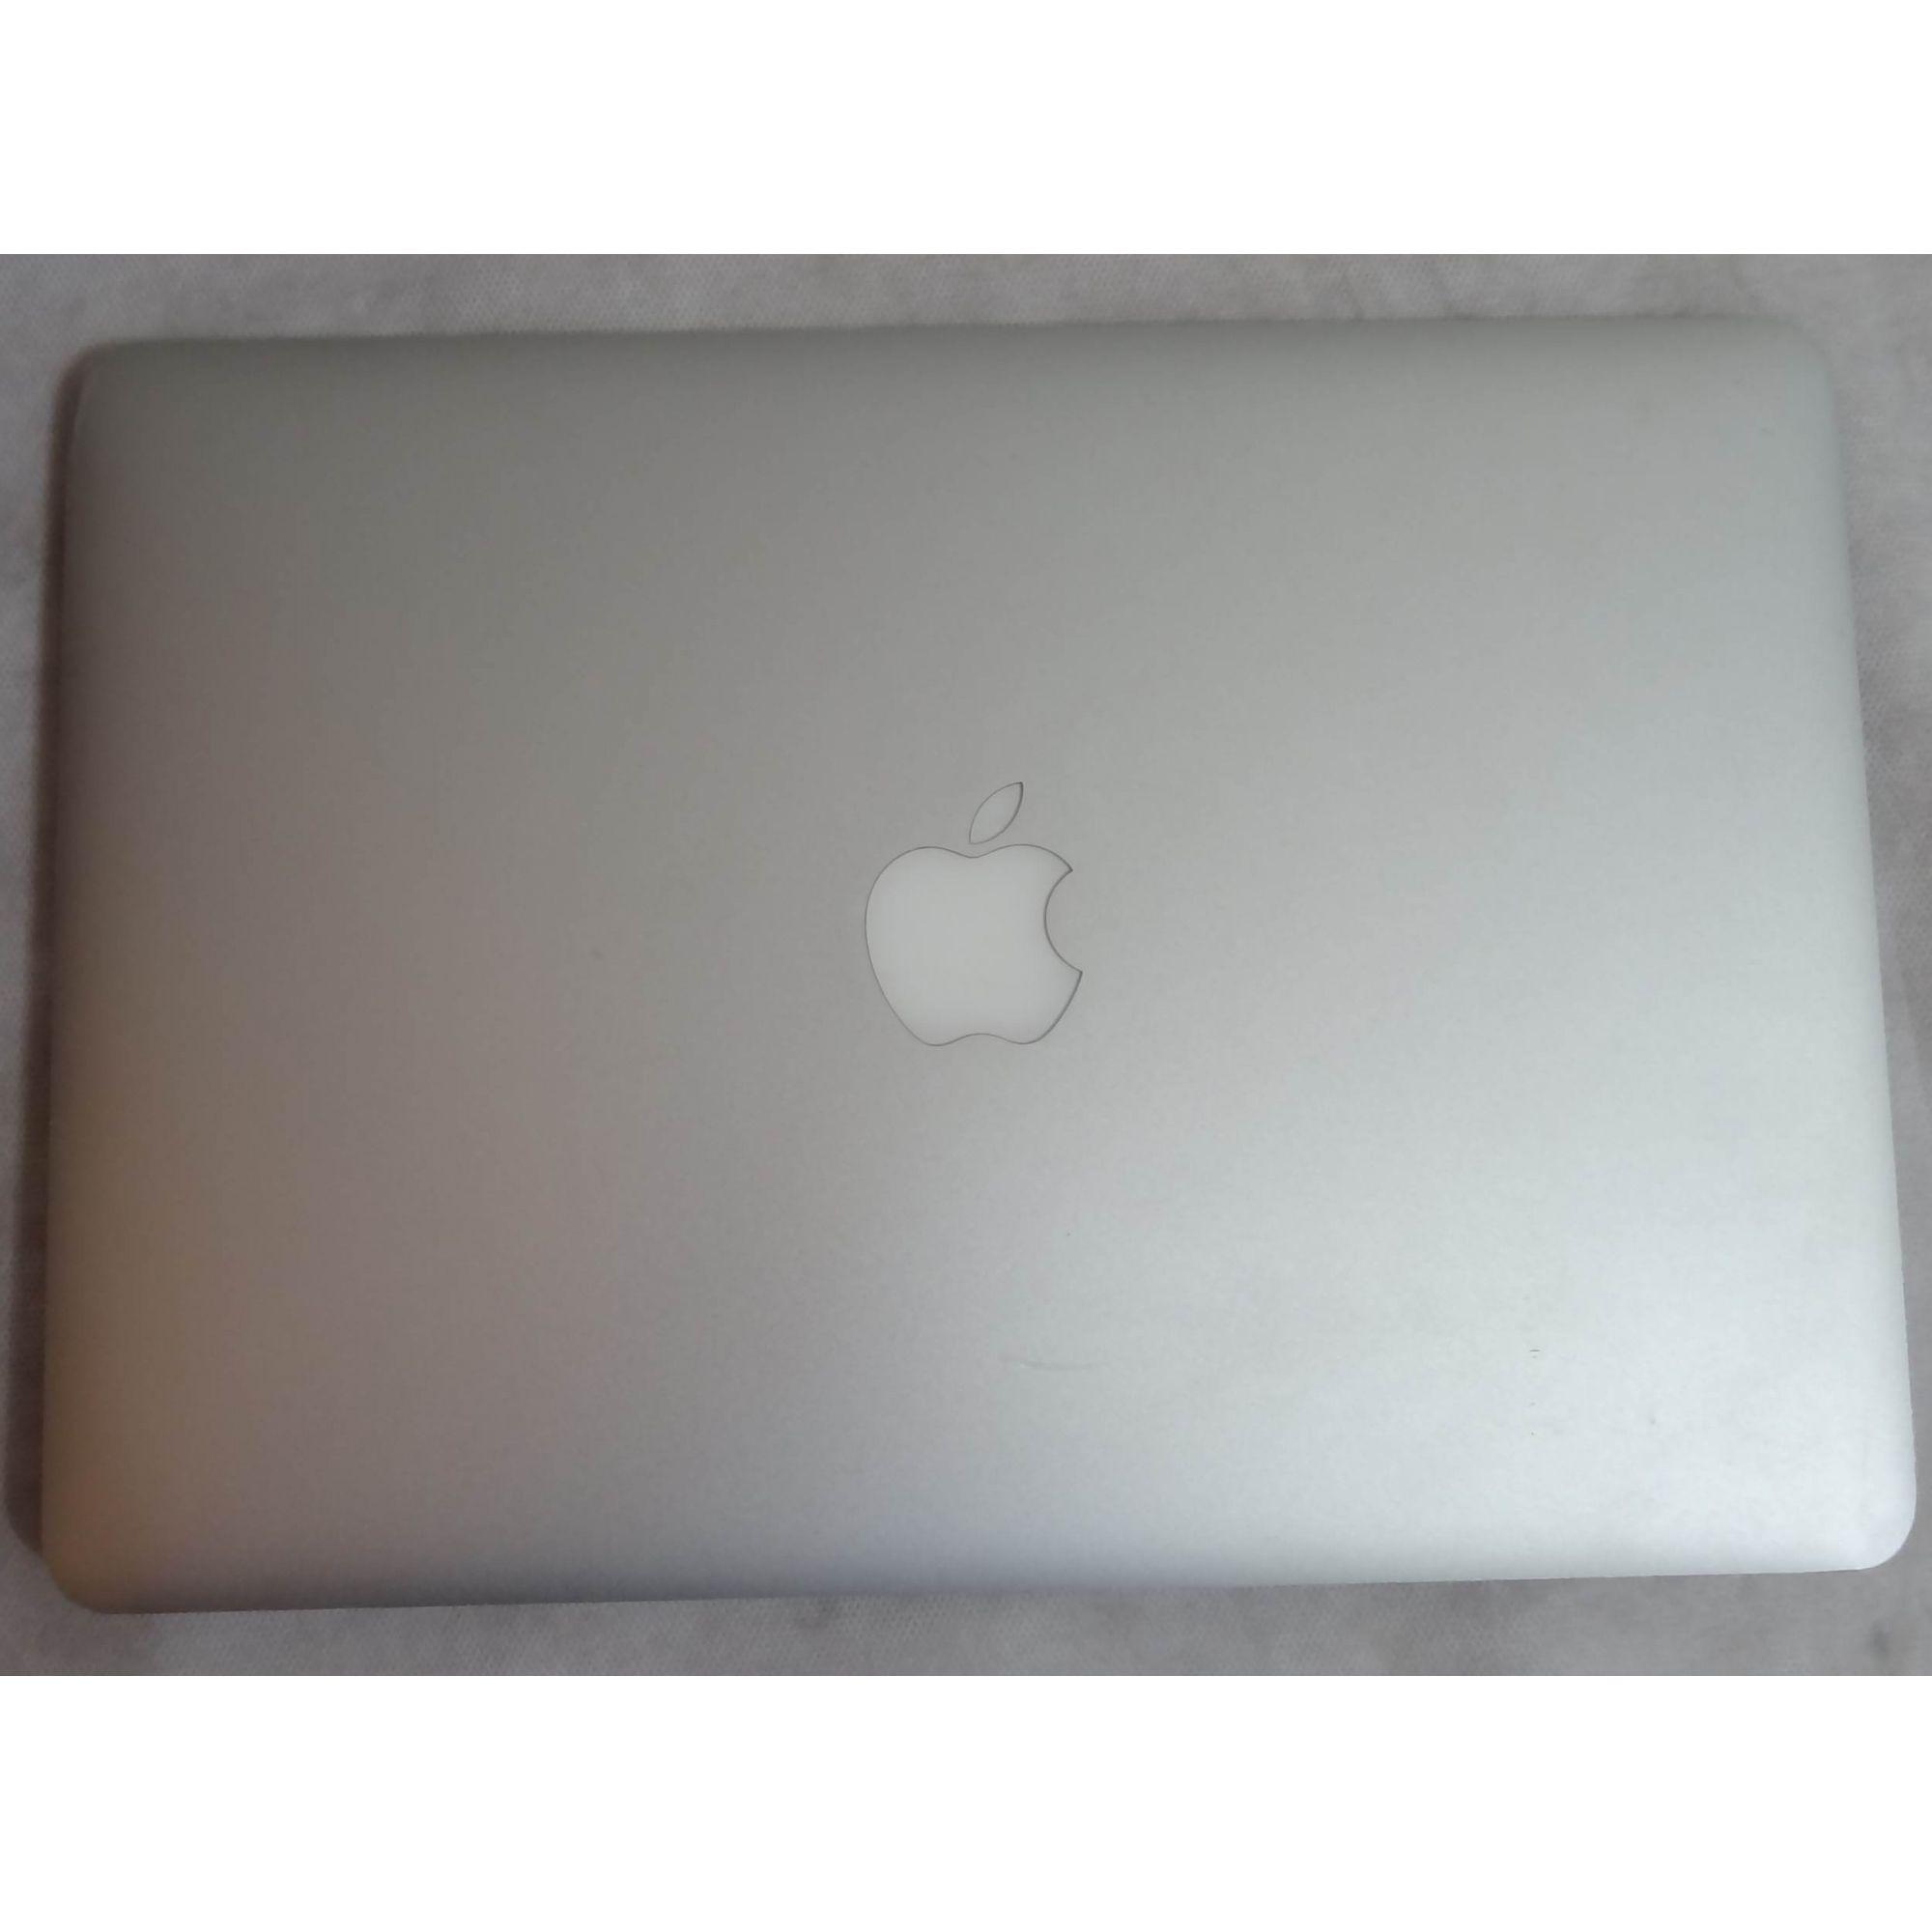 "MacBook Air MD760LL/A 13.3"" Intel Core i5 1.4GHz 4GB 128GB SSD (Não Enviamos)"